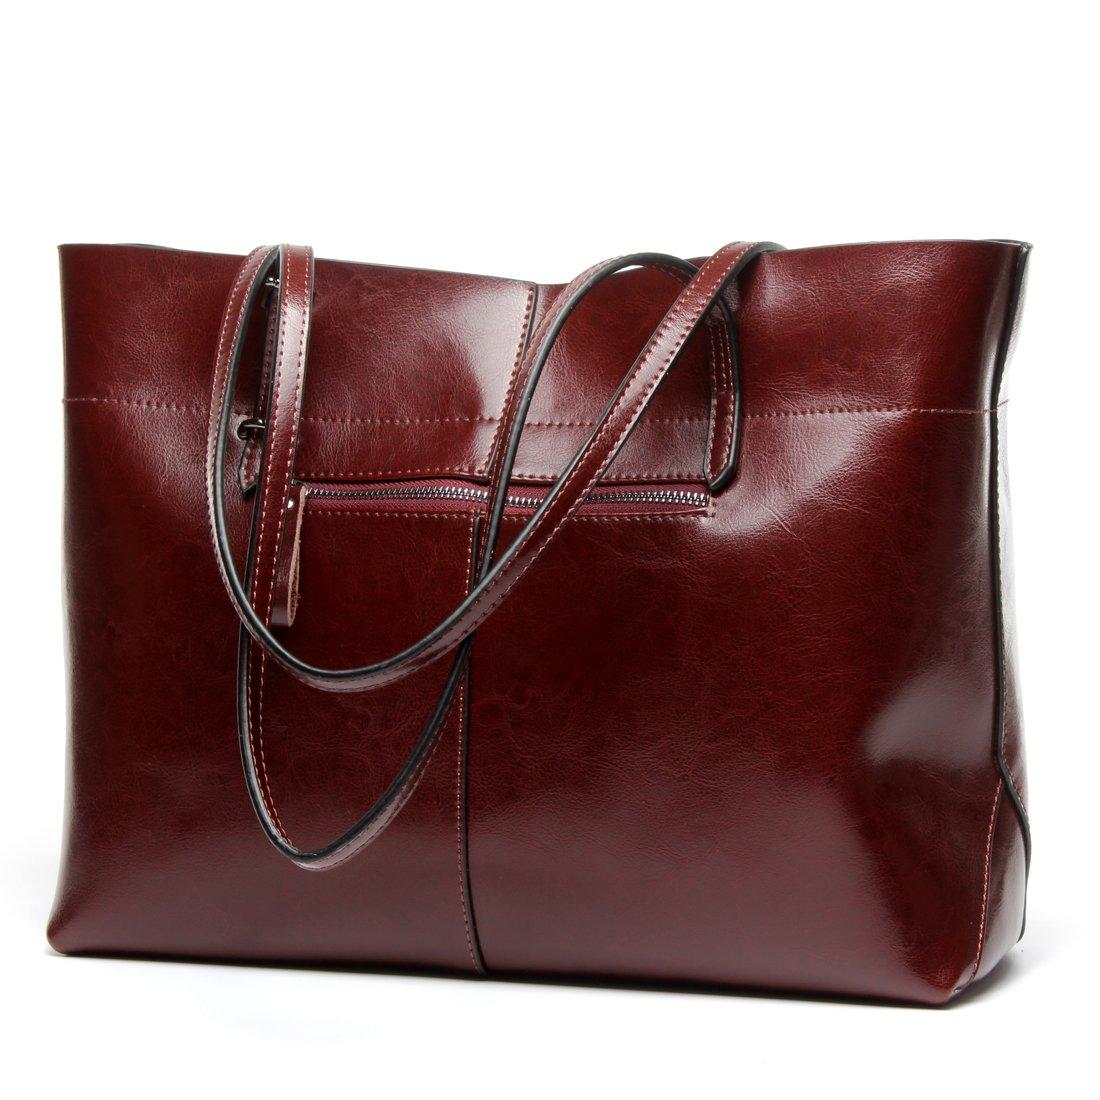 Covelin Women s Handbag Genuine Leather Tote Shoulder Bags Soft Hot product  image 3781fe66fc9